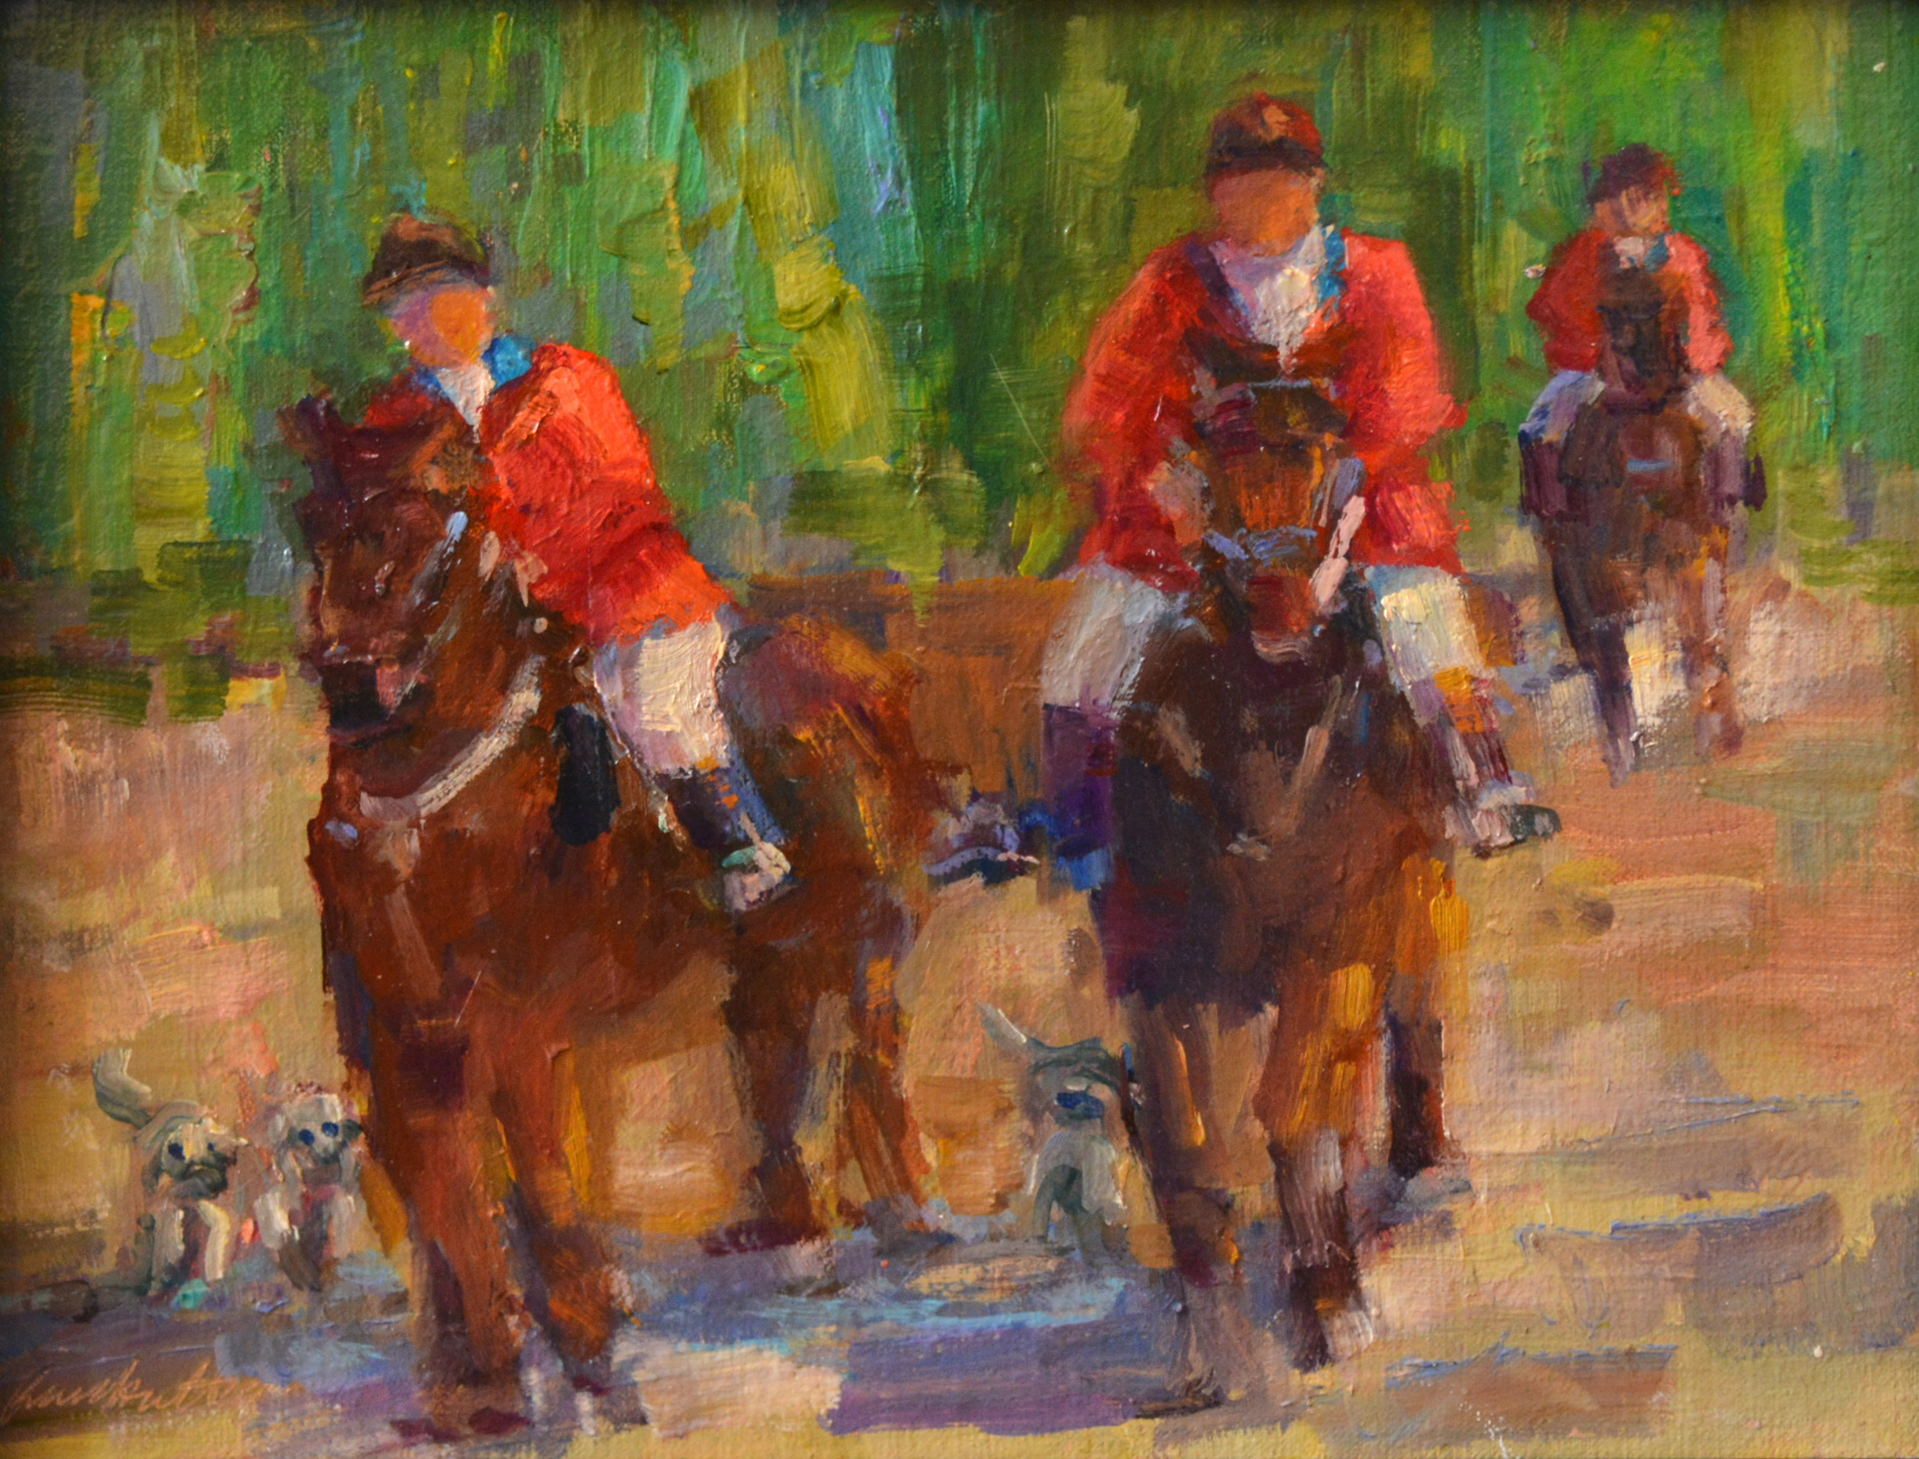 Riding to the Cast by Karen Hewitt Hagan